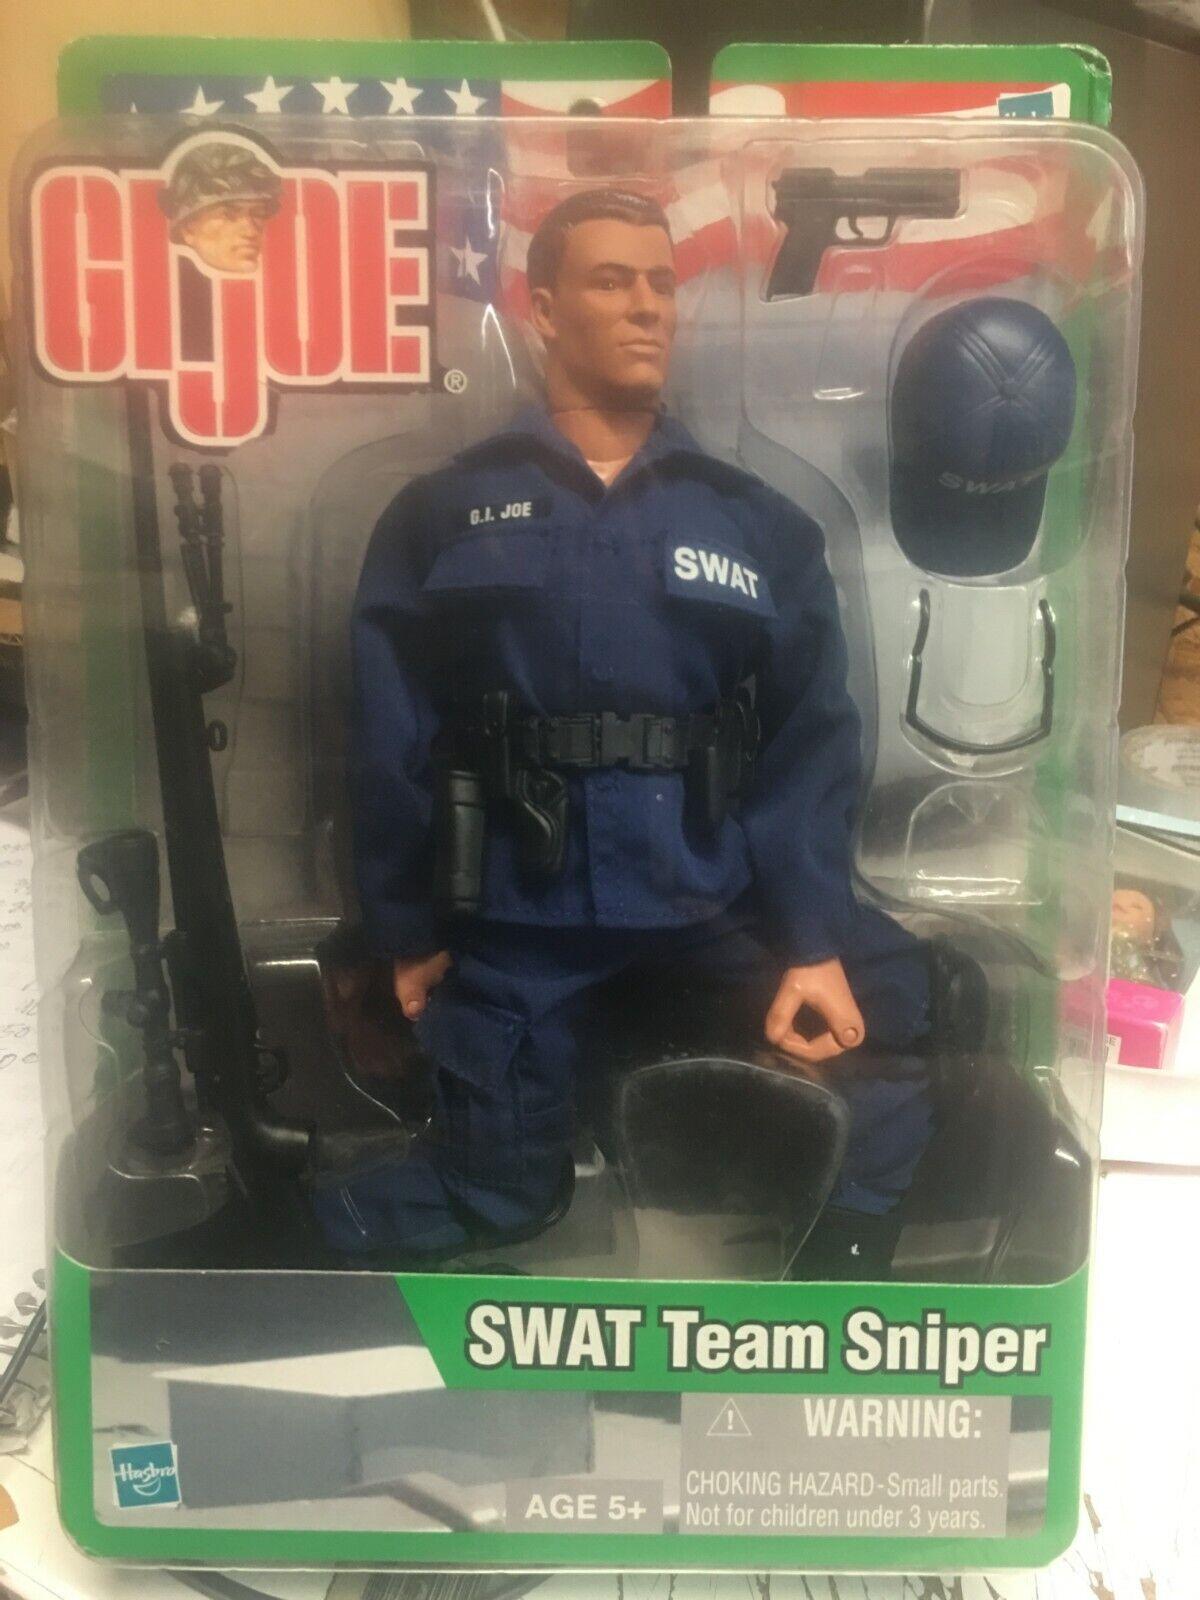 GI Joe Hasbro - 2002 - SWAT Team Sniper - VARIANT - BRAND NEW - RARE variant